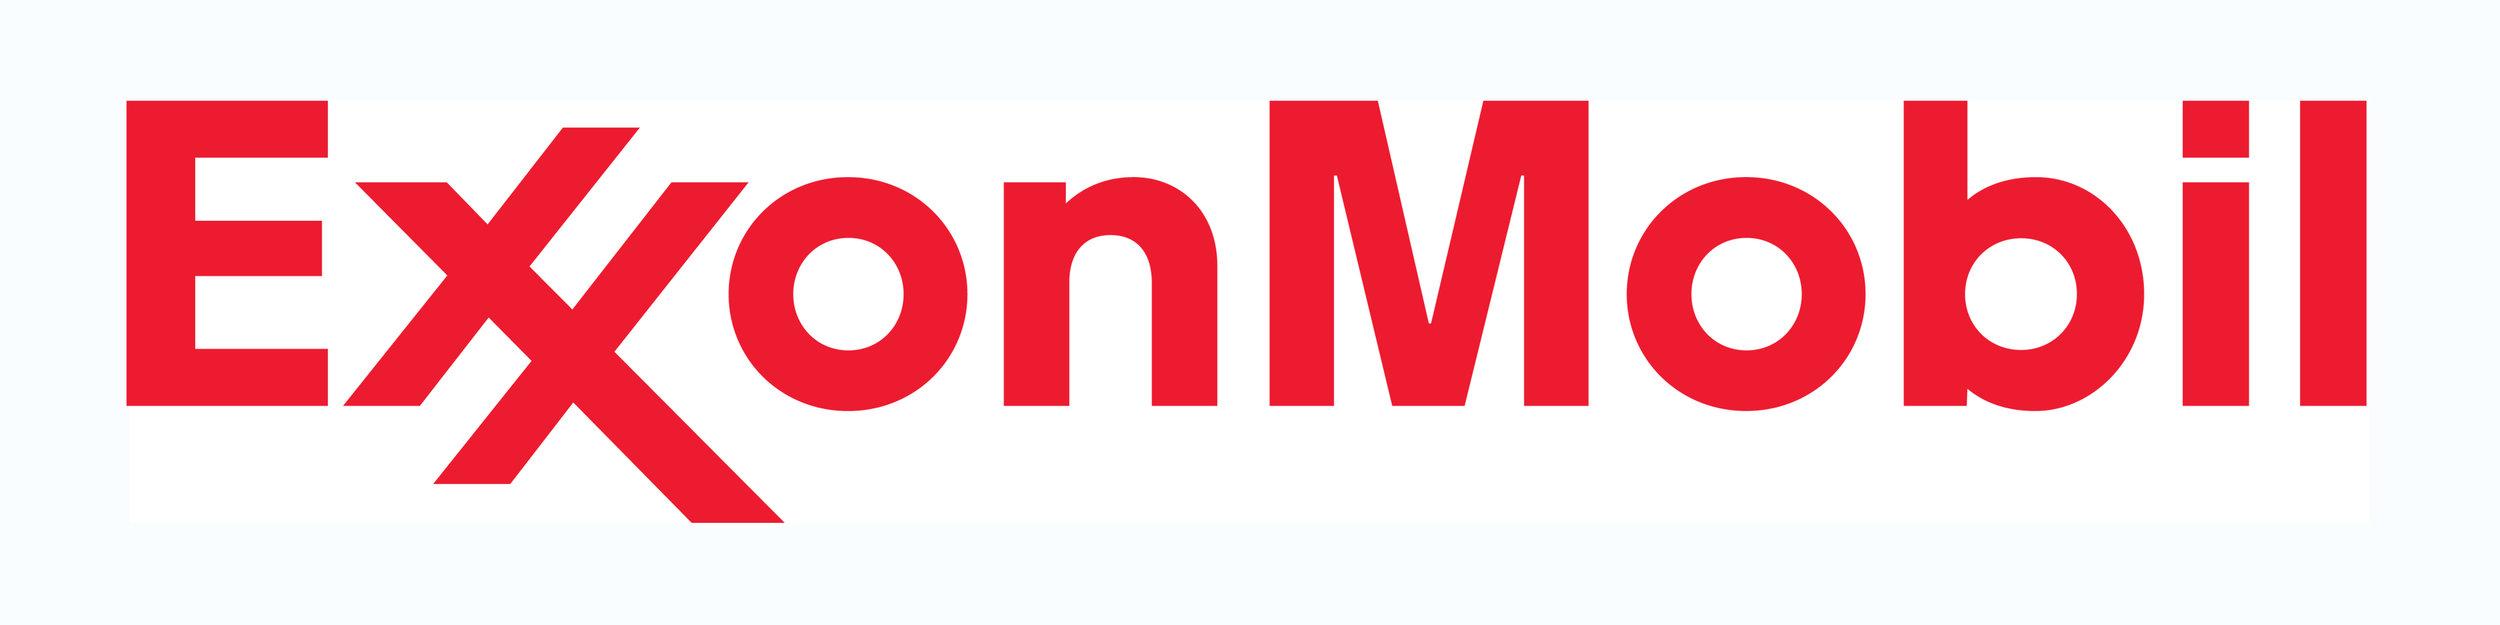 ExxonMobil_logo_red_300dpi.jpg